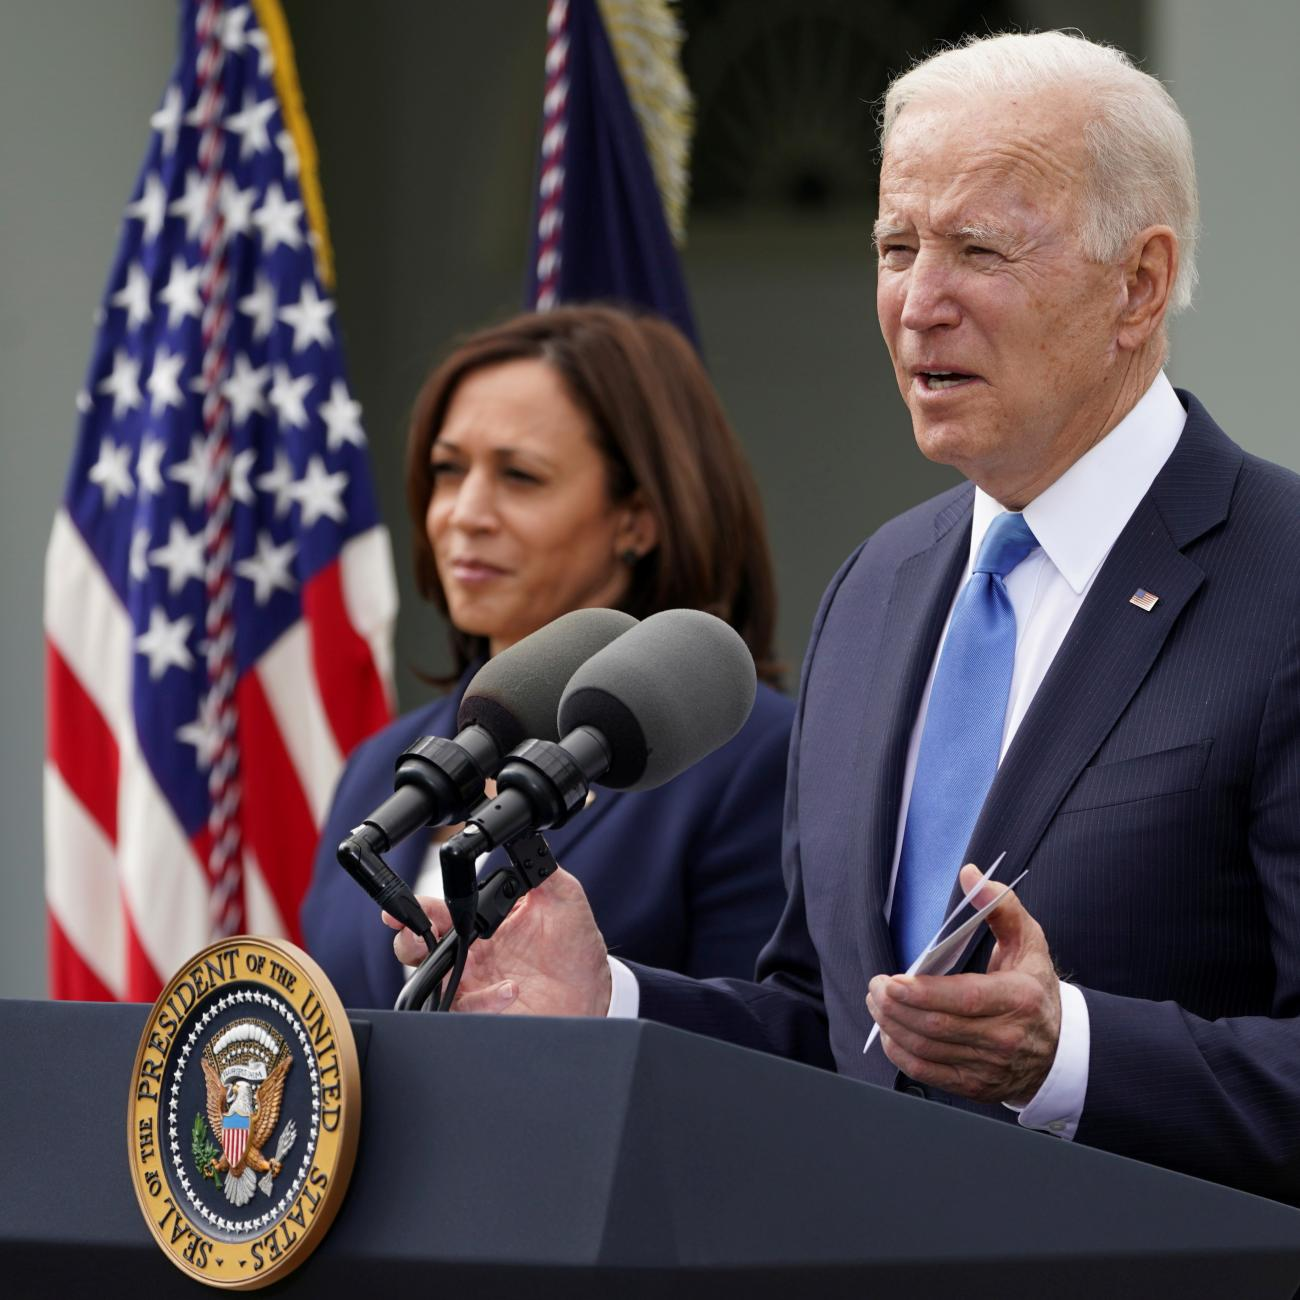 U.S. President Joe Biden, accompanied by Vice President Kamala Harris, speaks about the coronavirus disease (COVID-19) response and the vaccination program from the Rose Garden of the White House in Washington, U.S., May 13, 2021.